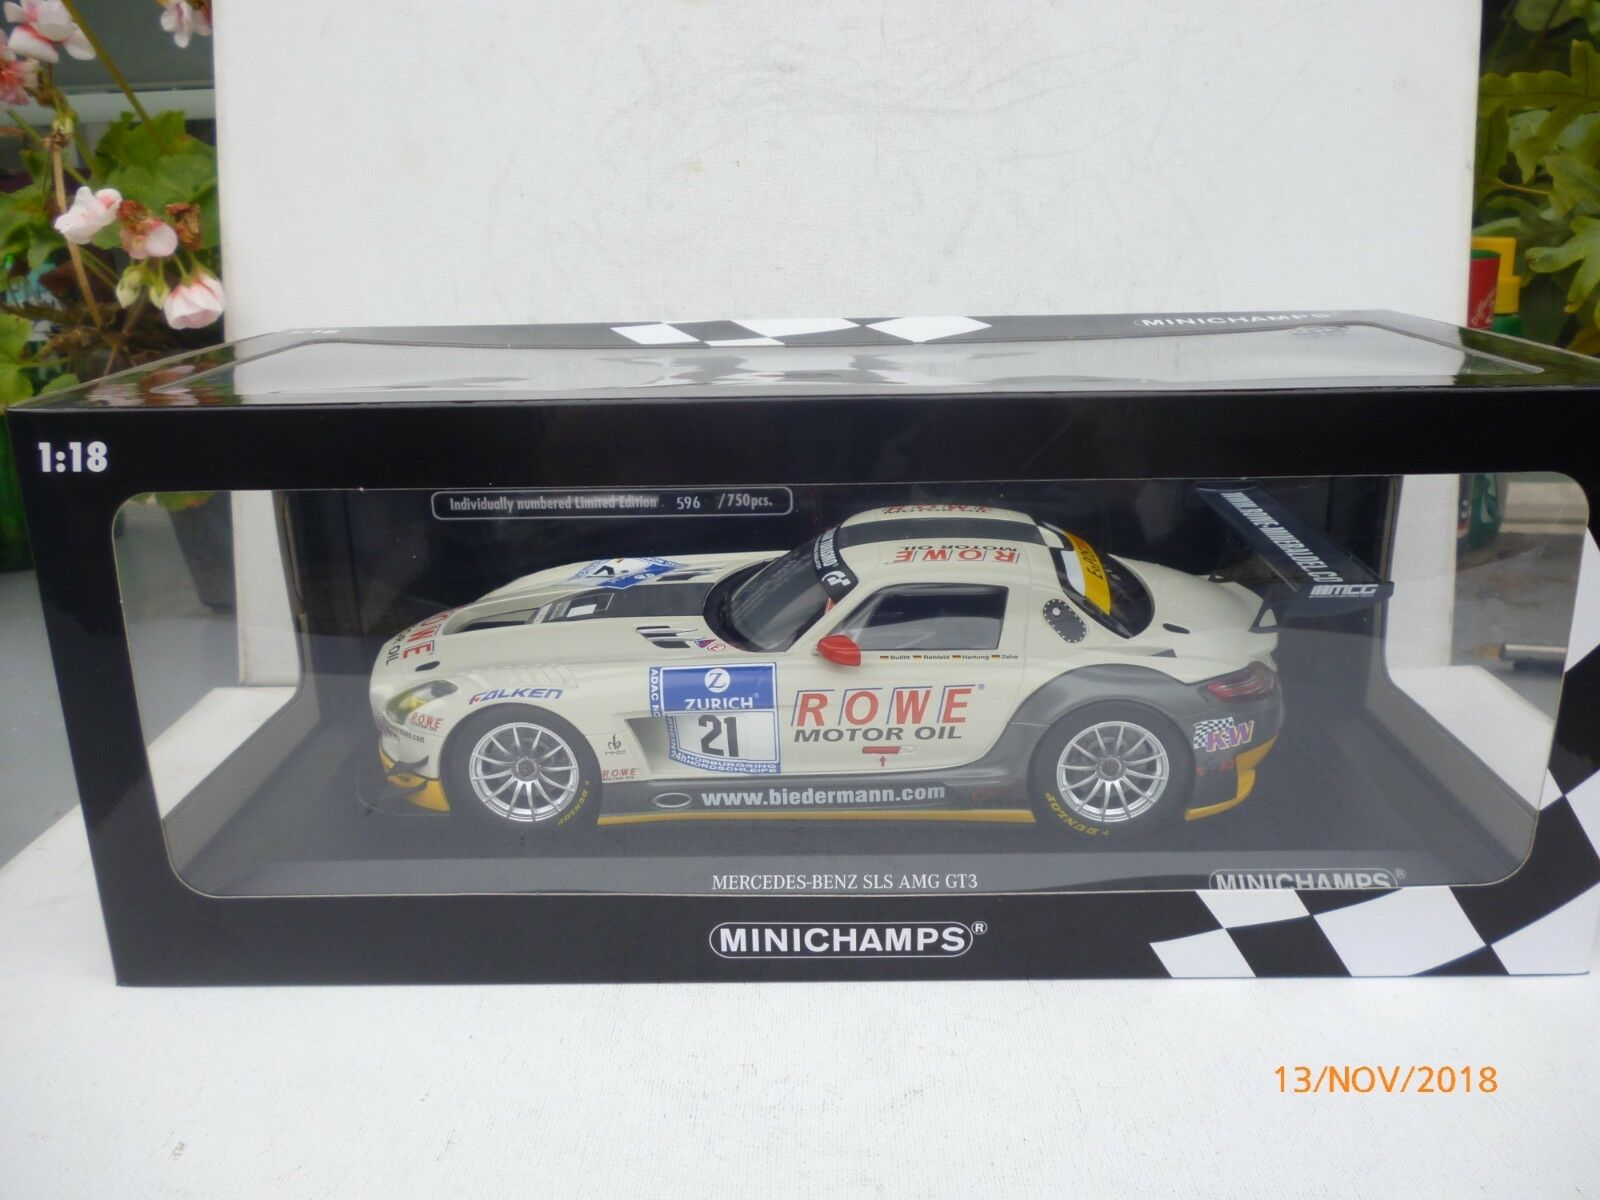 Minichamps Mercedes-Benz SLS AMG GT3 2012 1 18  21 24h NürburgringNEW OVP